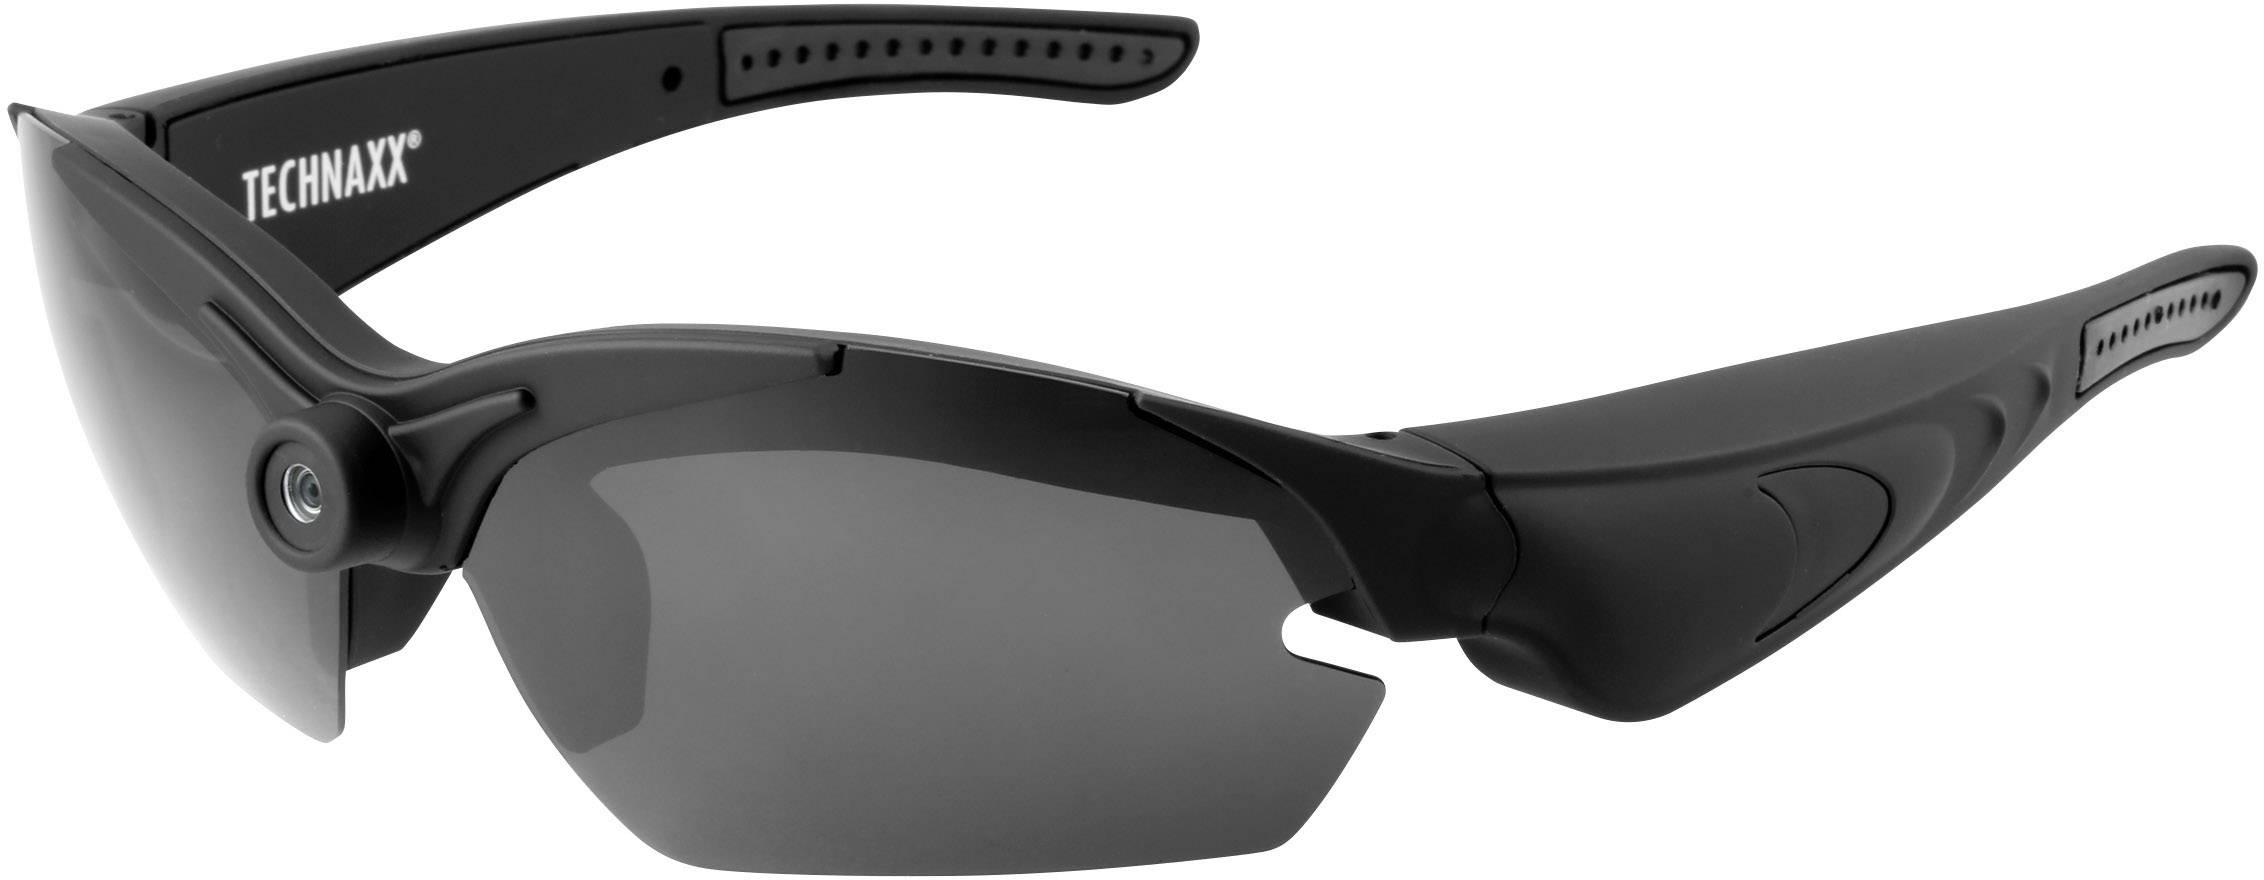 Športová kamera v okuliaroch Technaxx TX-25 4358